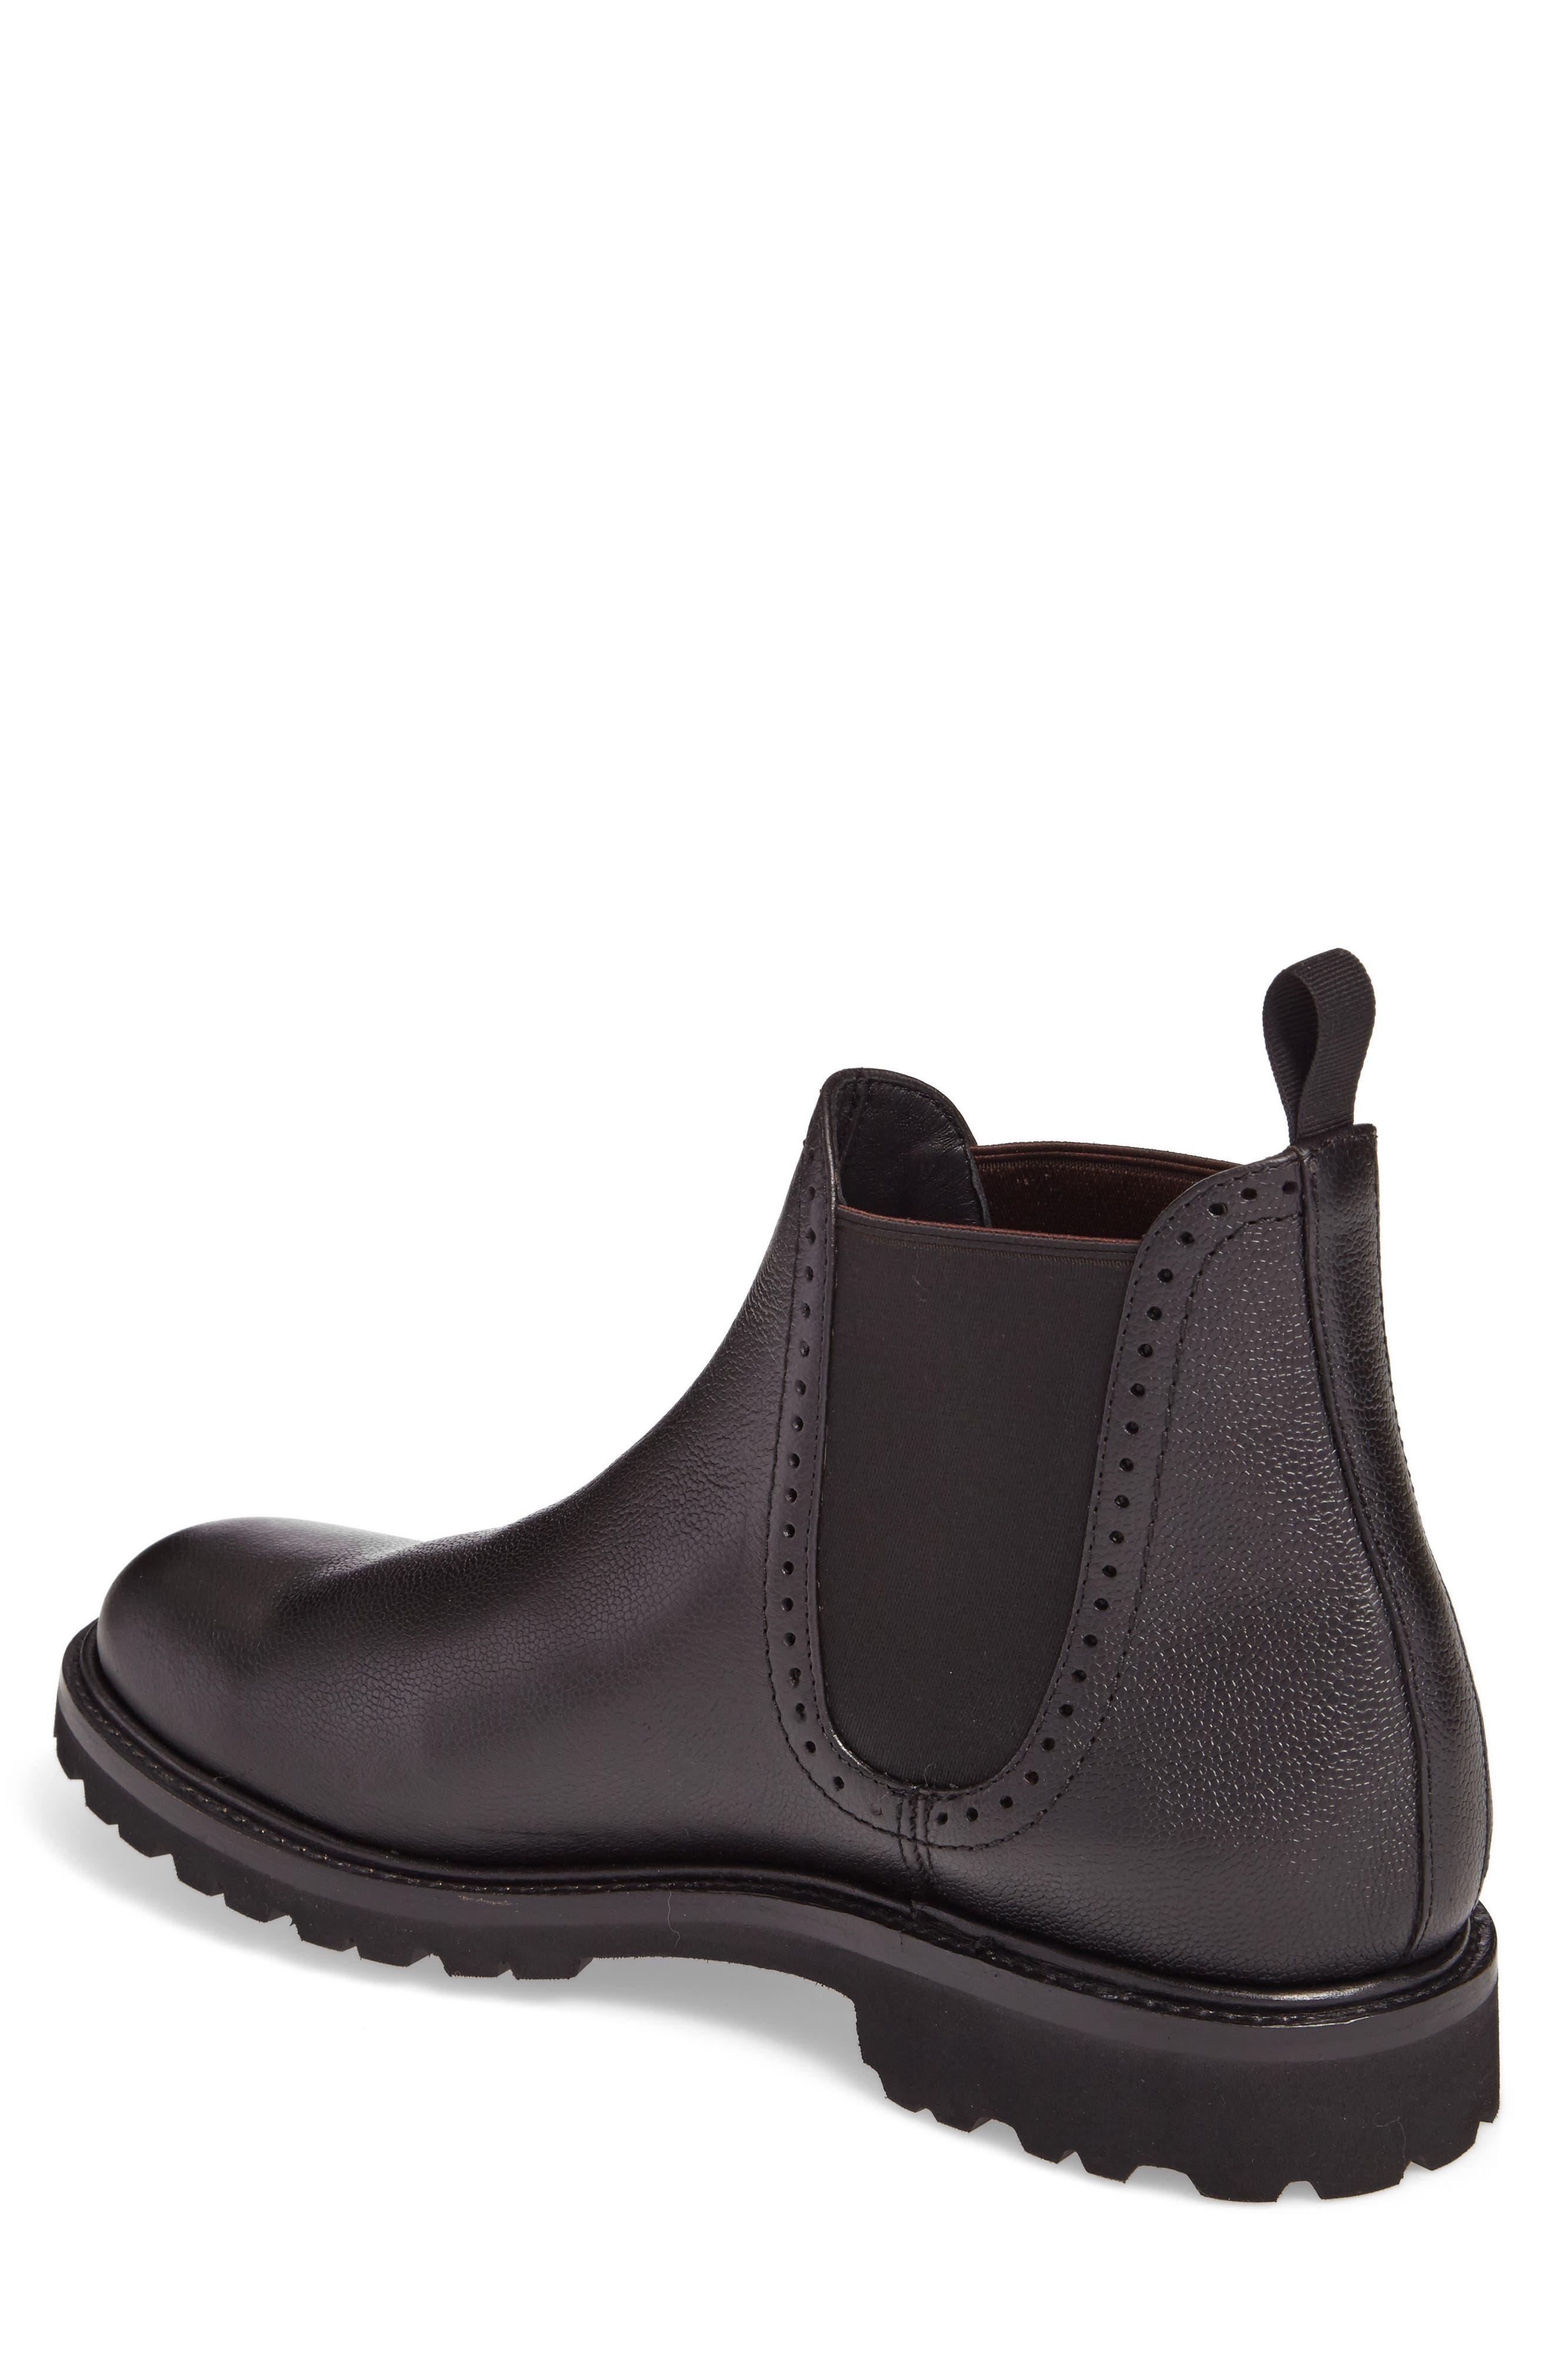 Cromwell Chelsea Boot,                             Alternate thumbnail 2, color,                             Black